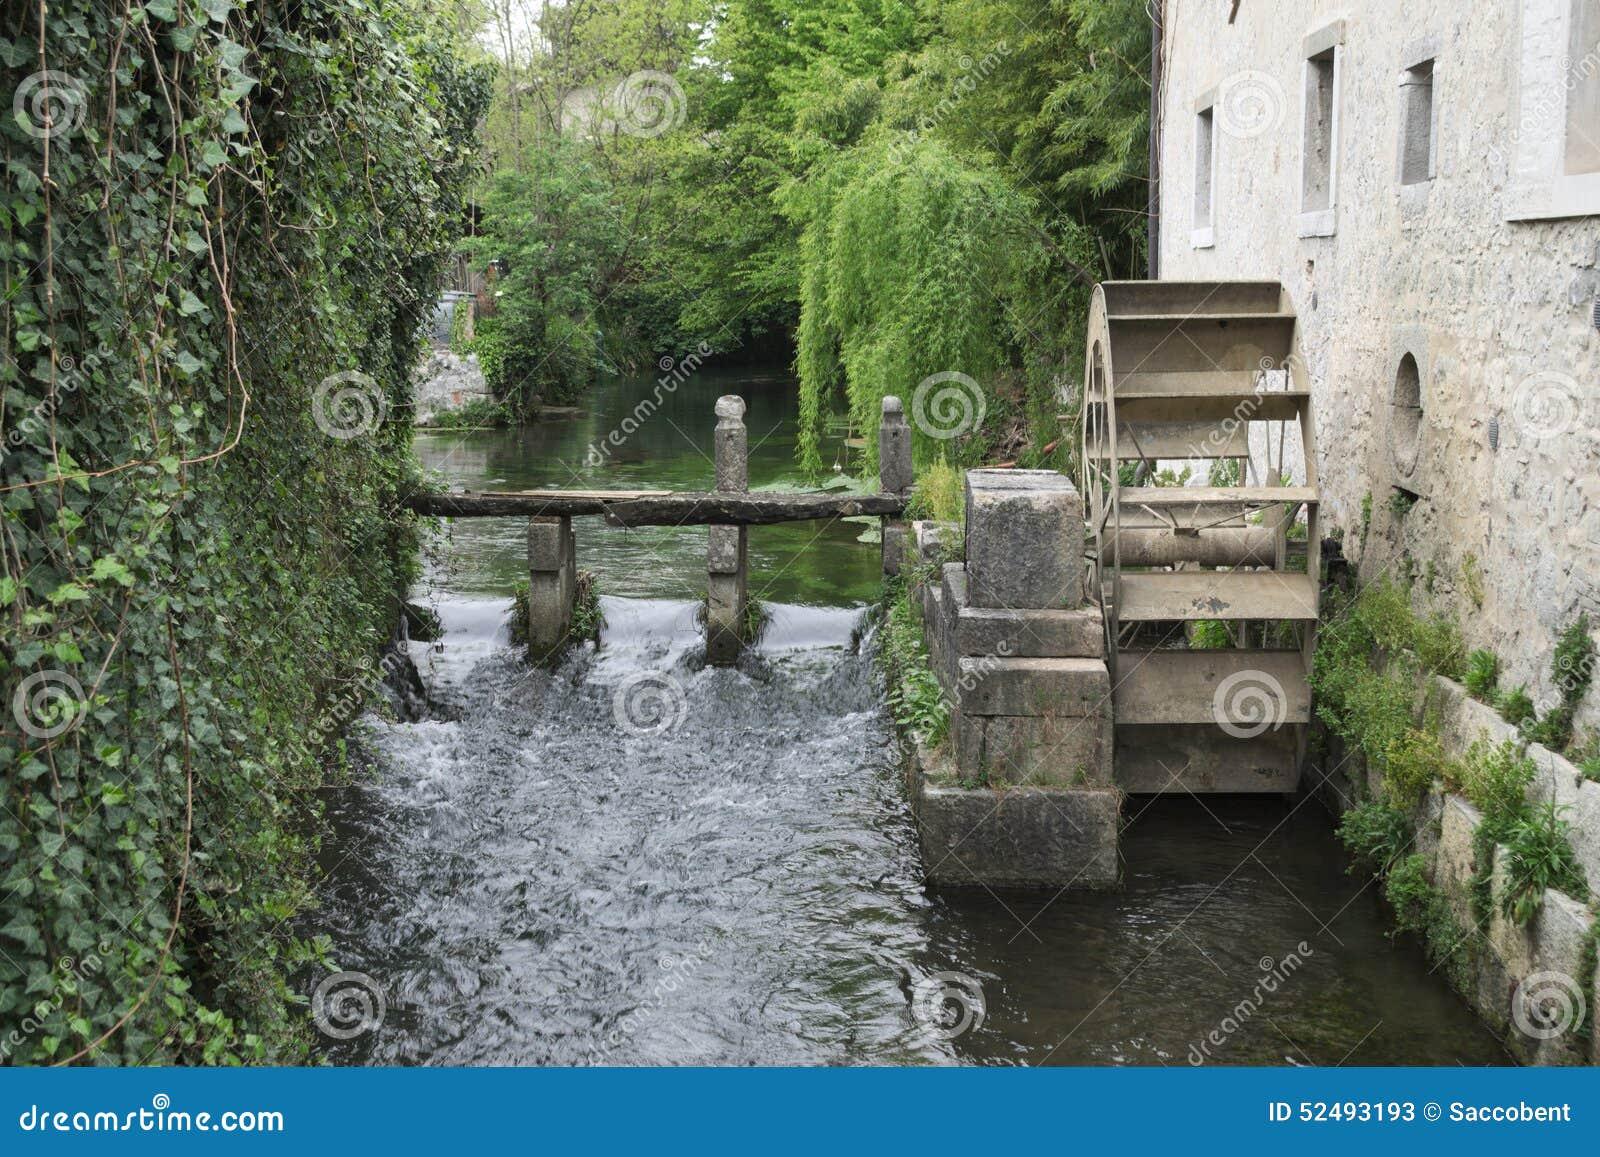 wheel water mill in strassoldo s castle friuli italy stock image